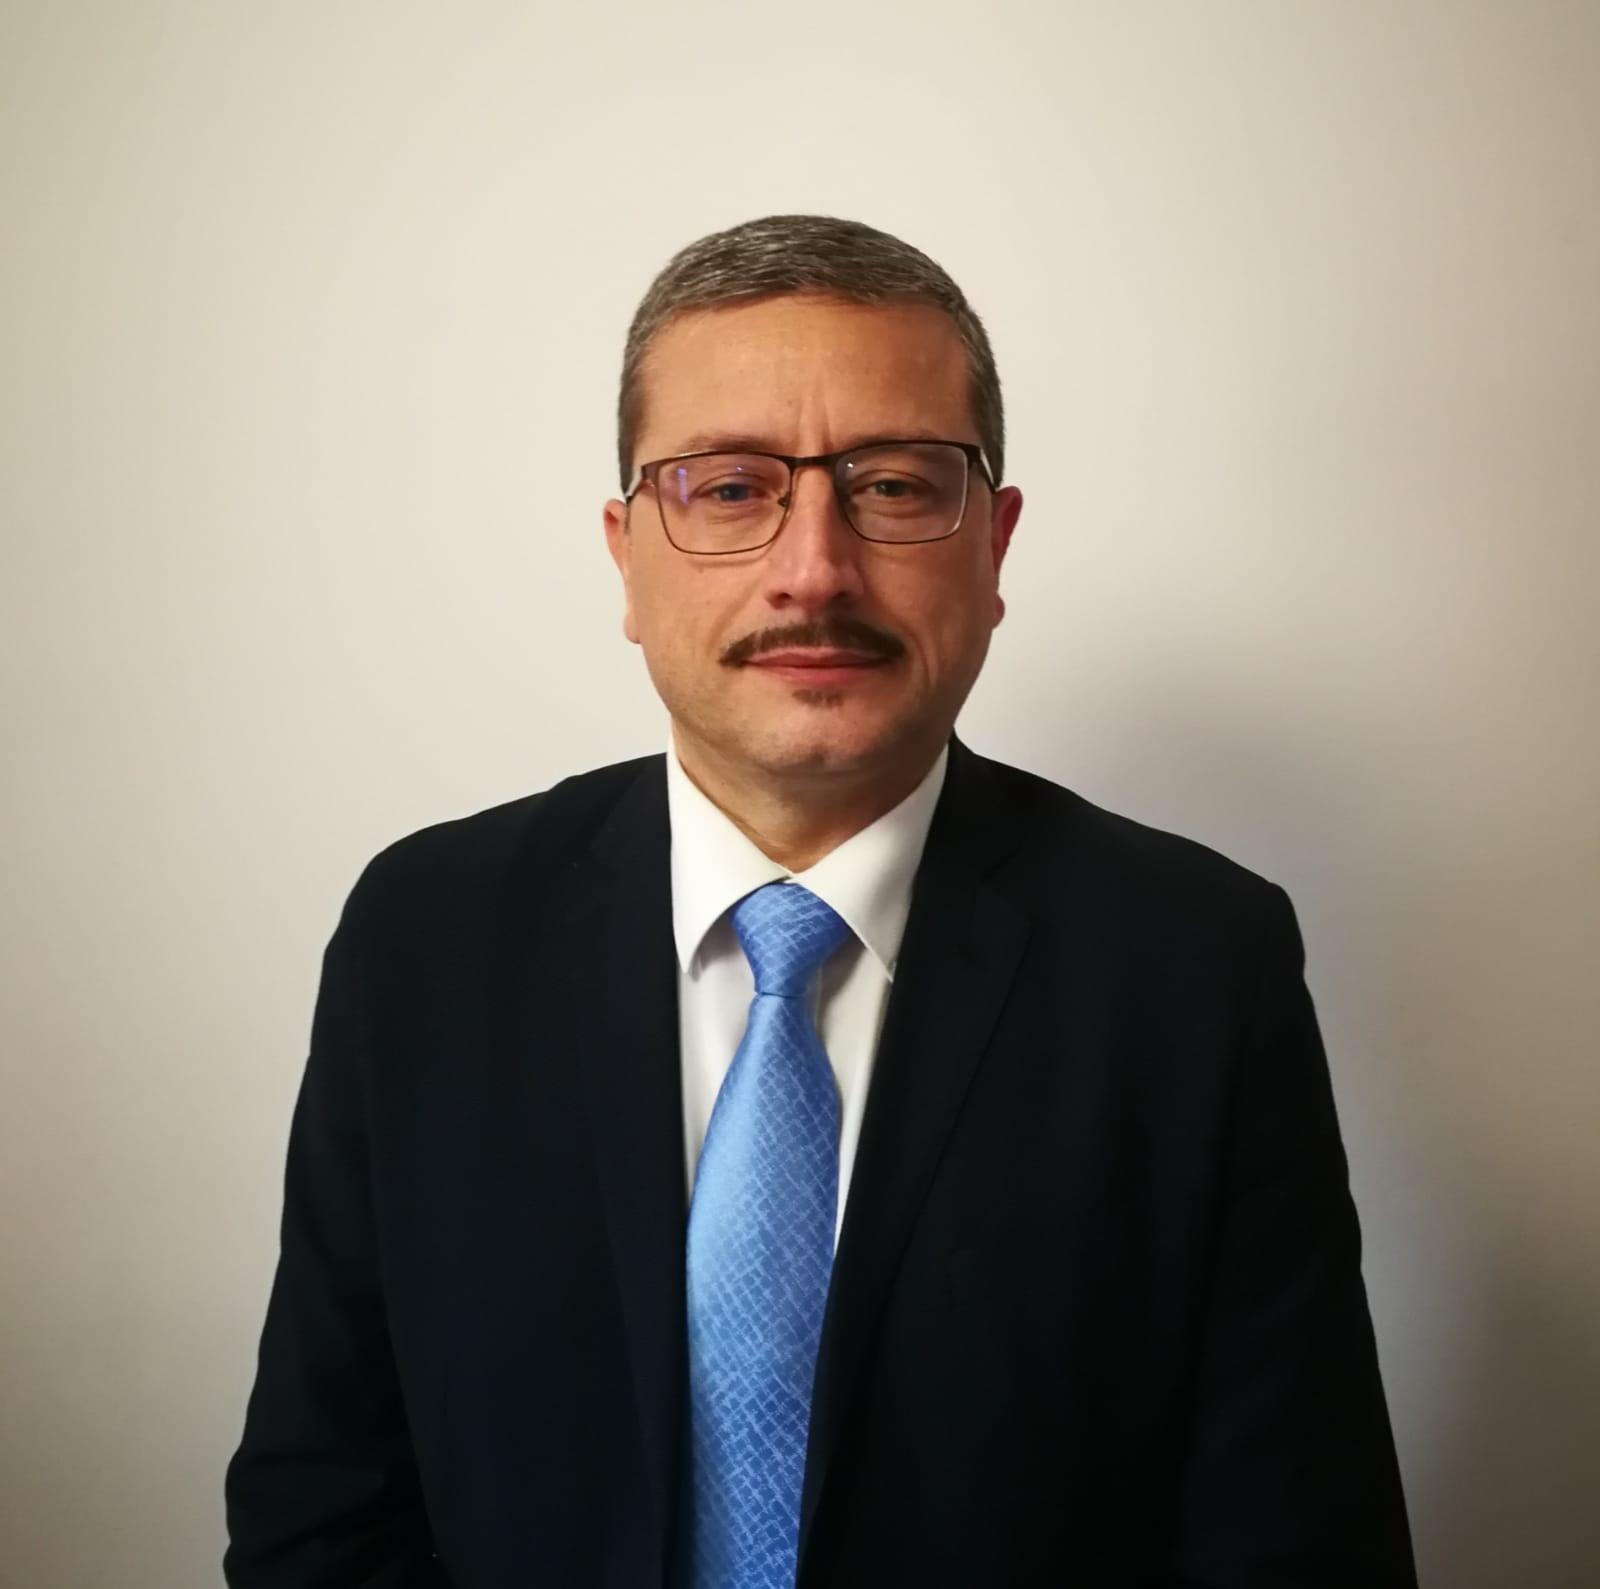 Dott. Luigi Galluccio